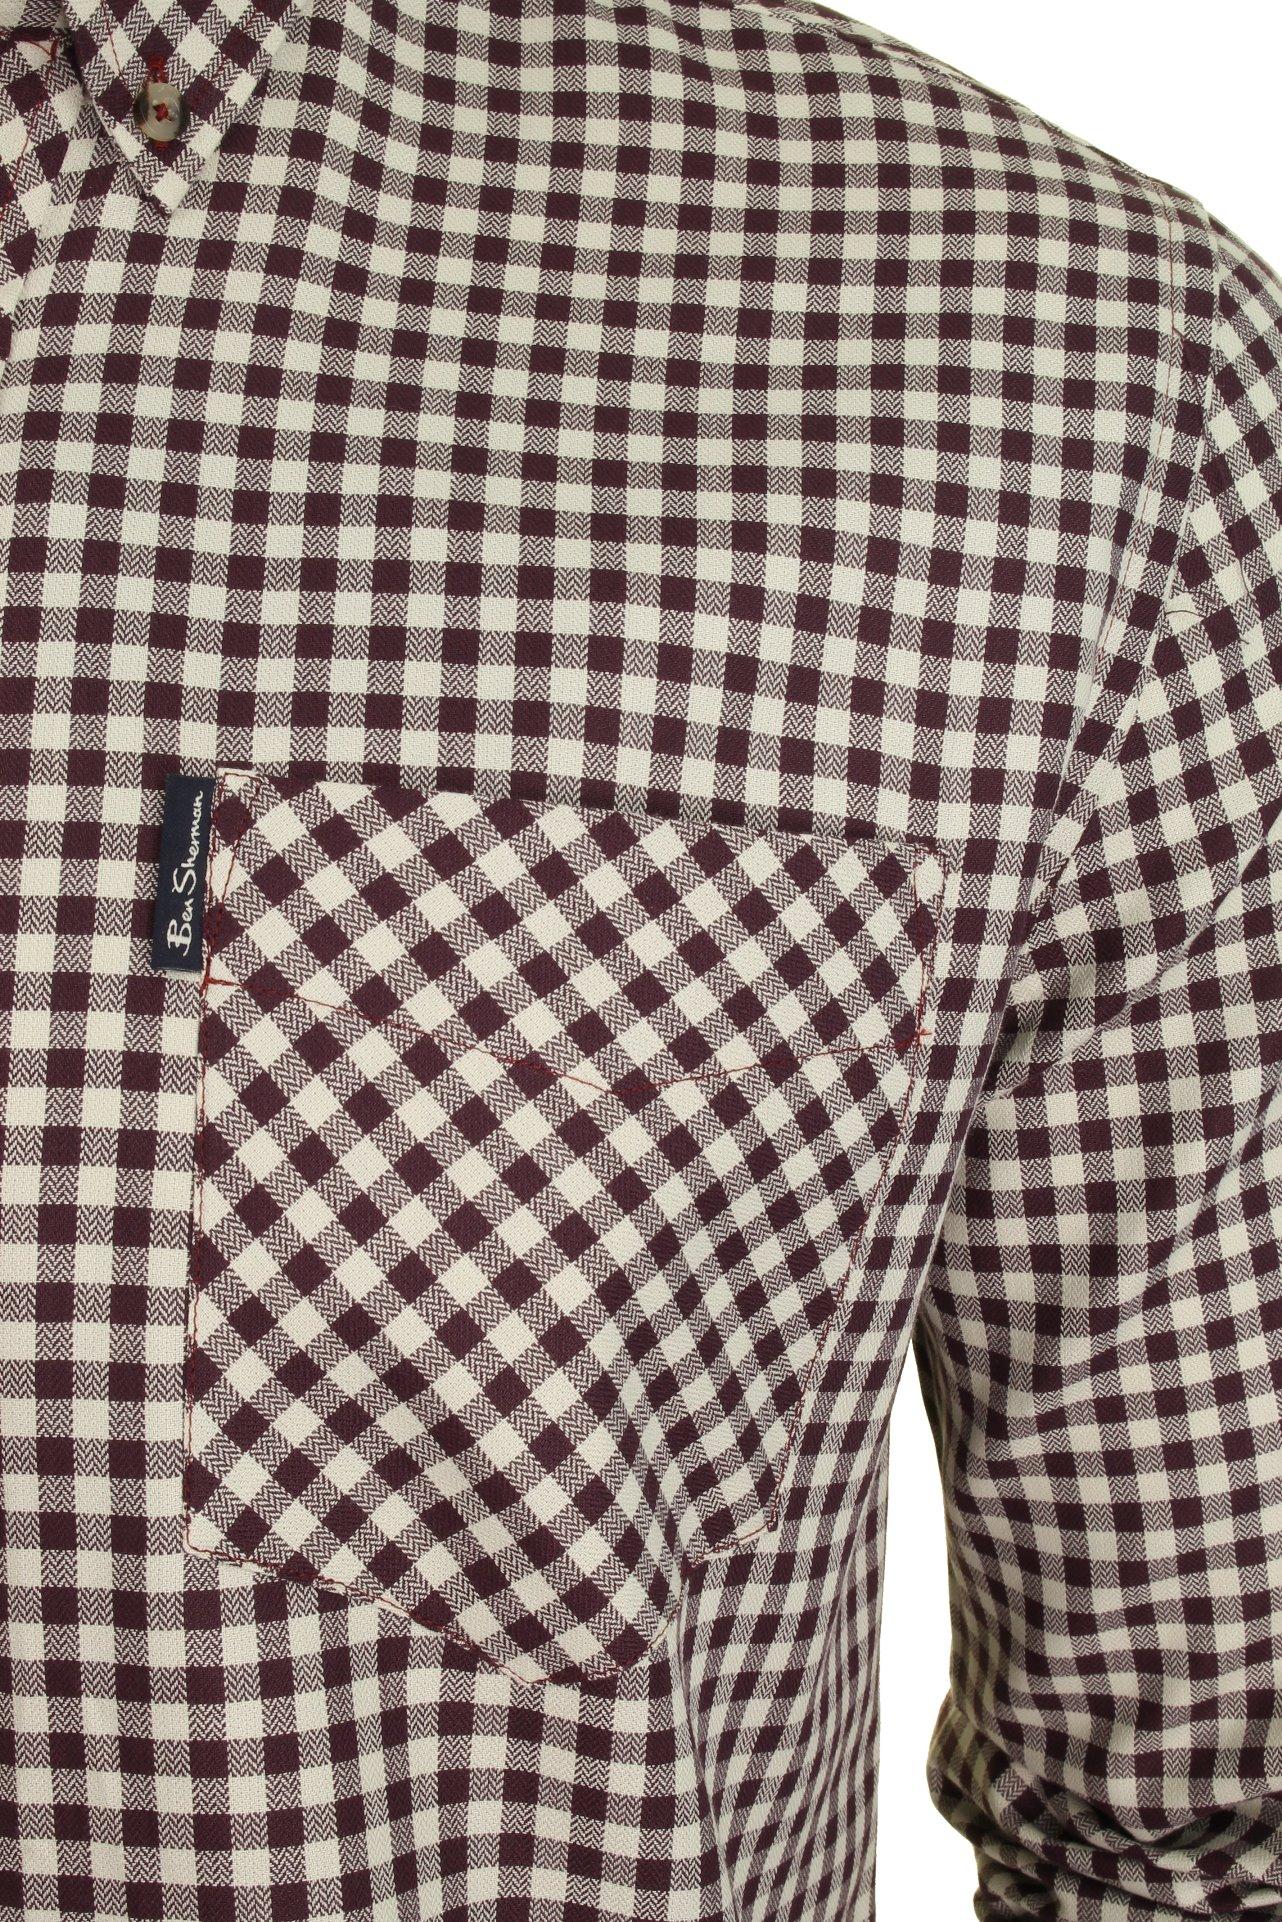 Mens-Ben-Sherman-Long-Sleeved-Shirt-Brushed-Gingham-Check thumbnail 7